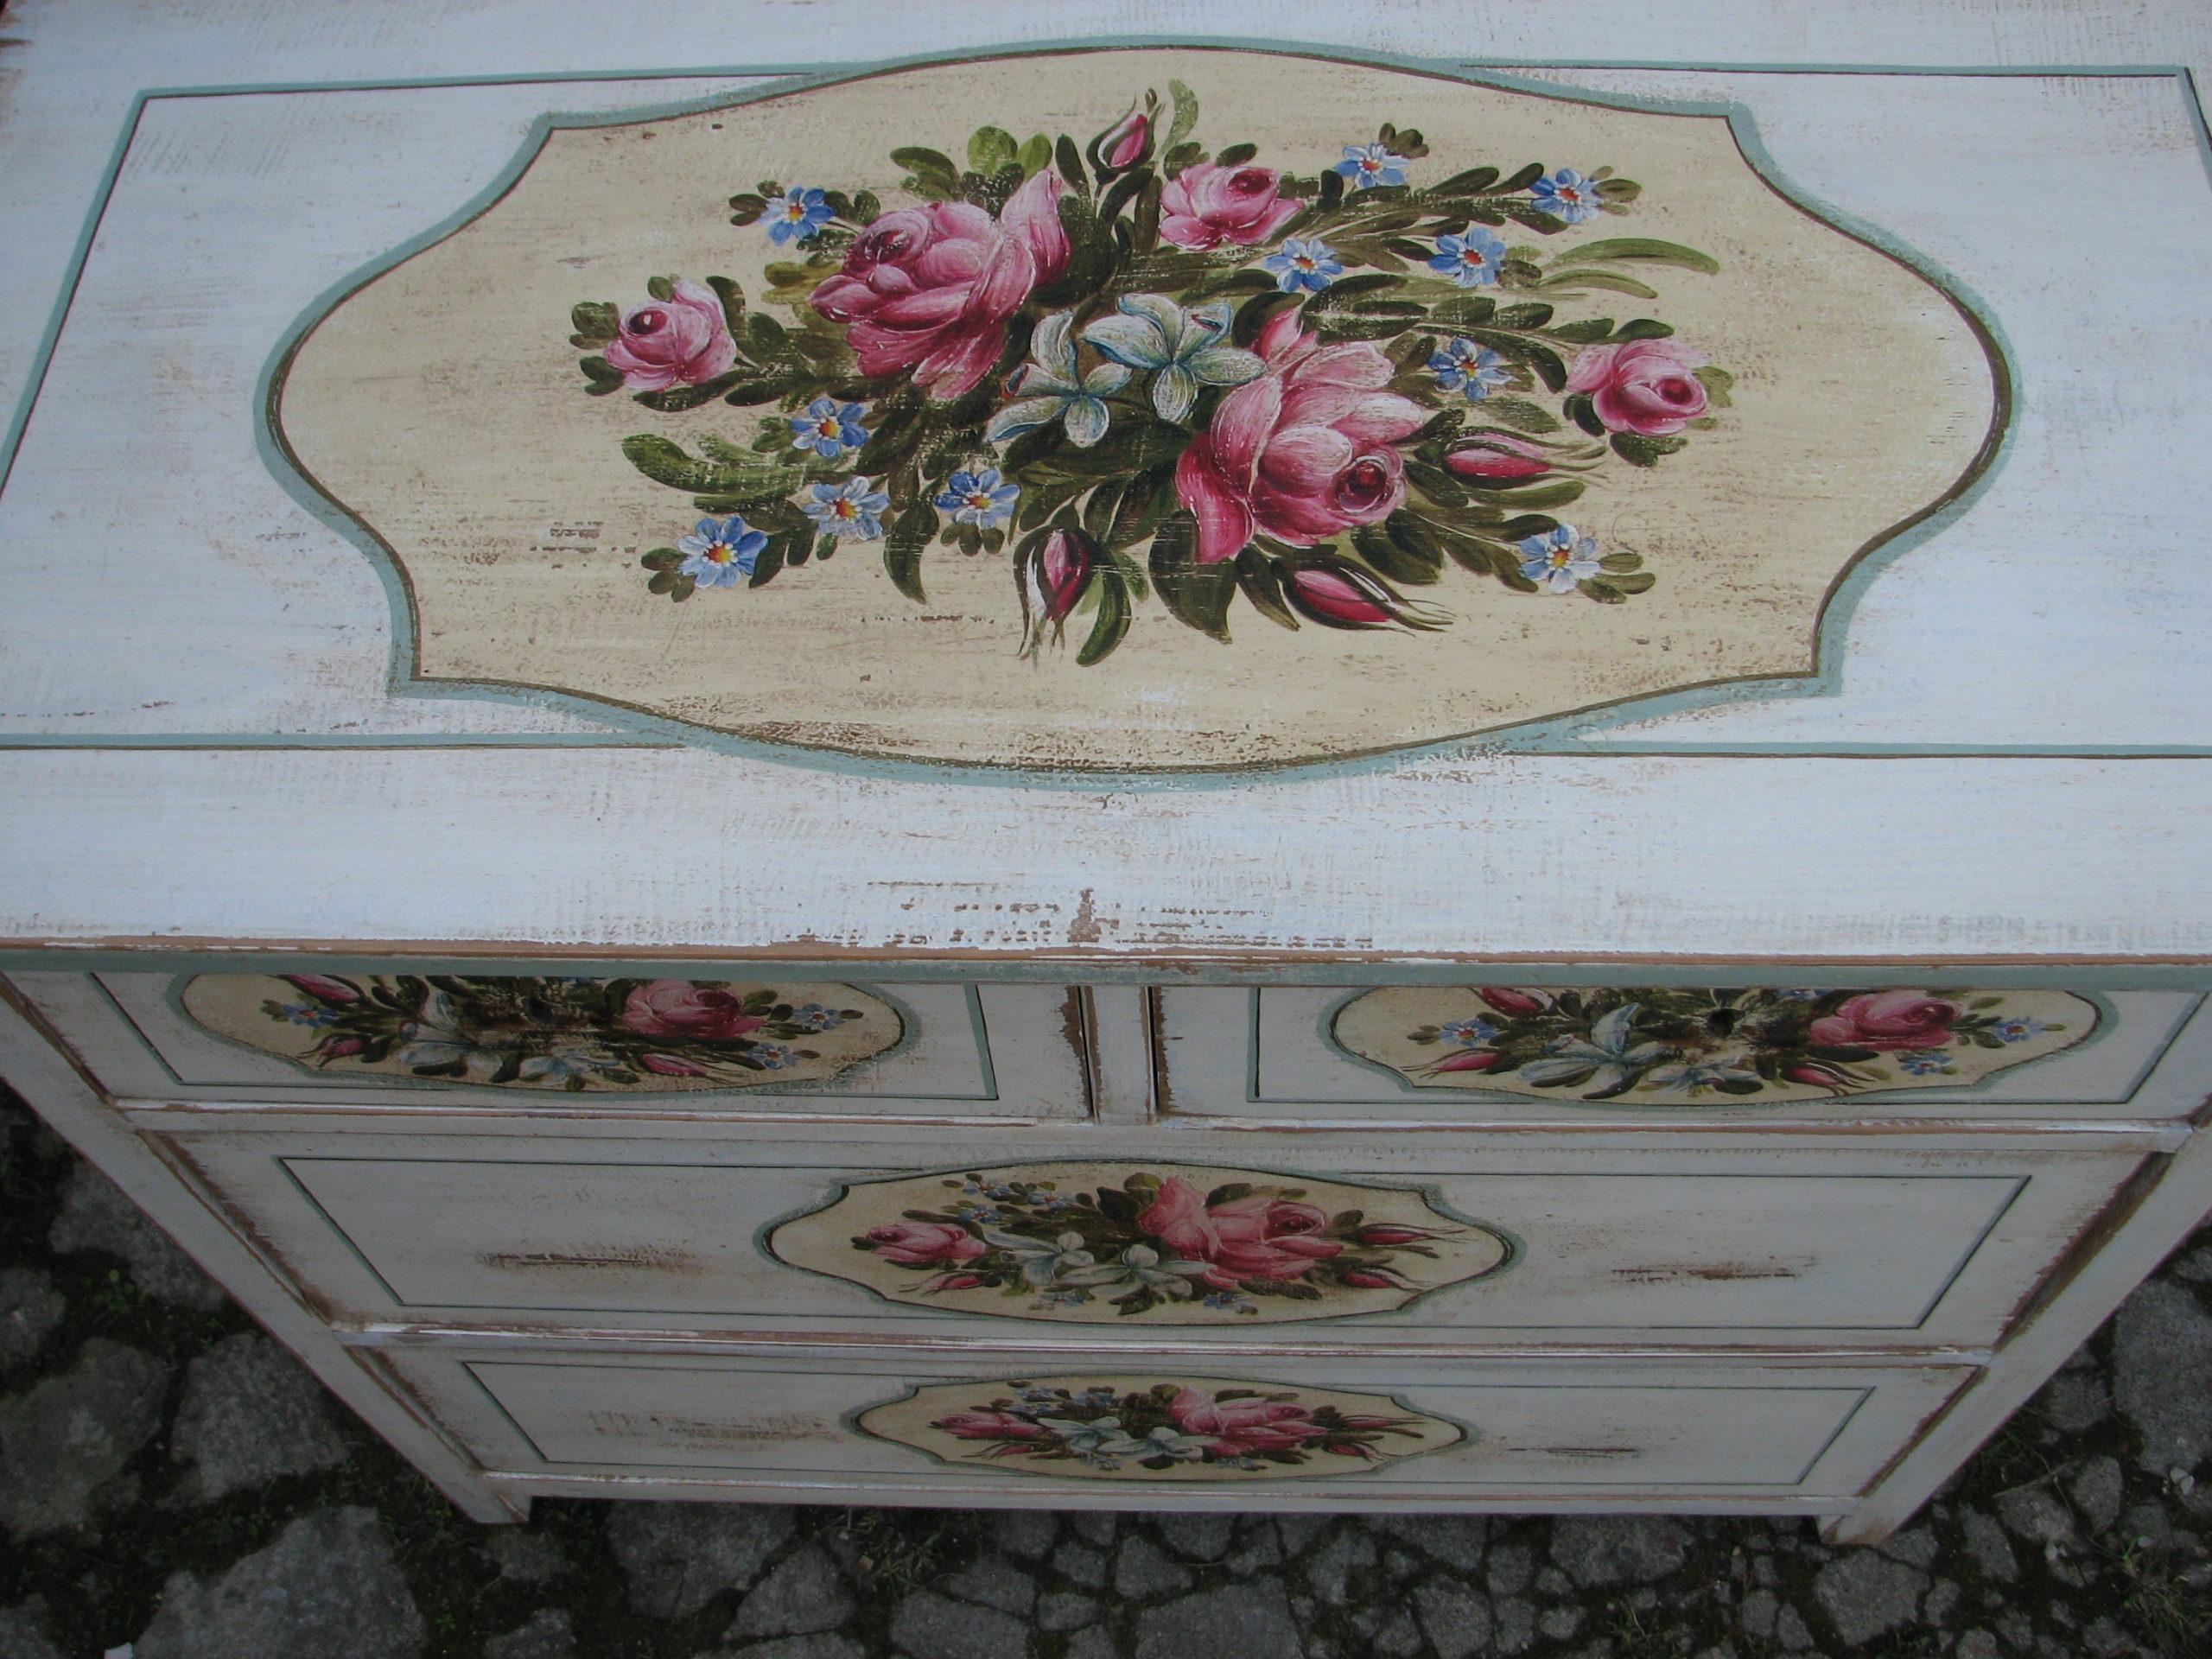 Malovaná bílá komoda s květinami v romantickém stylu detail